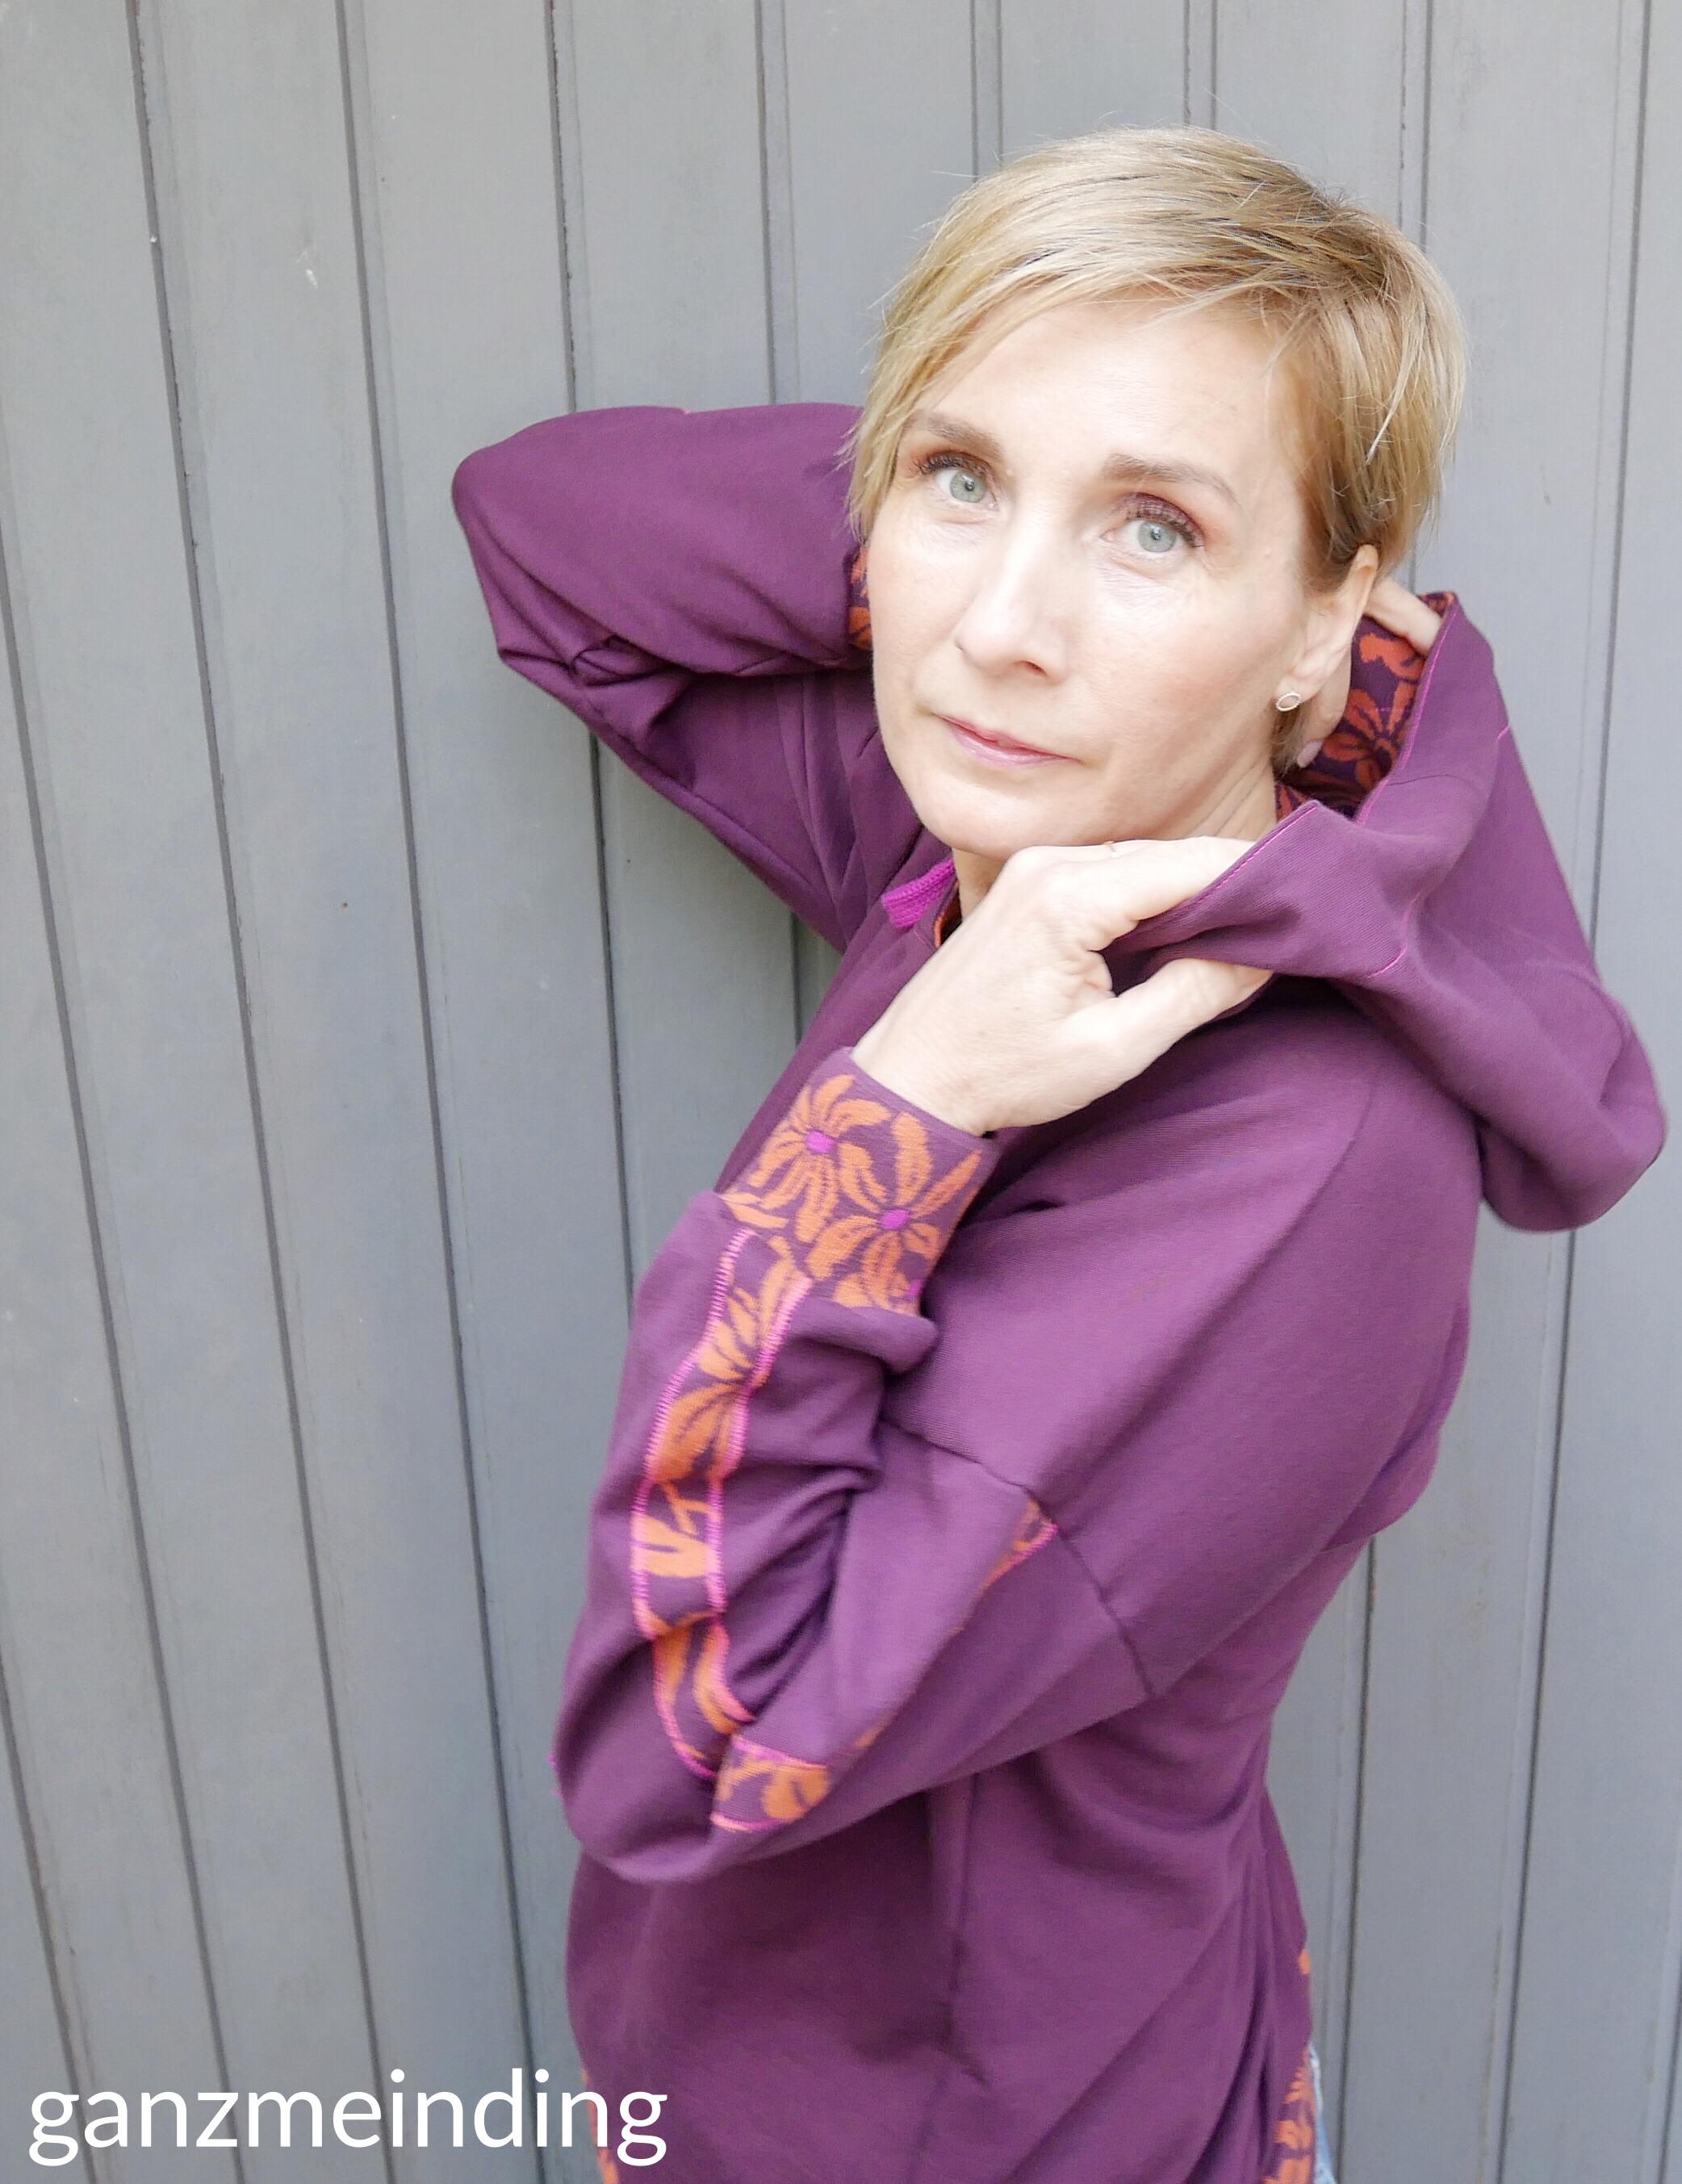 ganzmeinding: Flur Hello Heidi Fabrics, Hoodie 01 die Komplizin 04